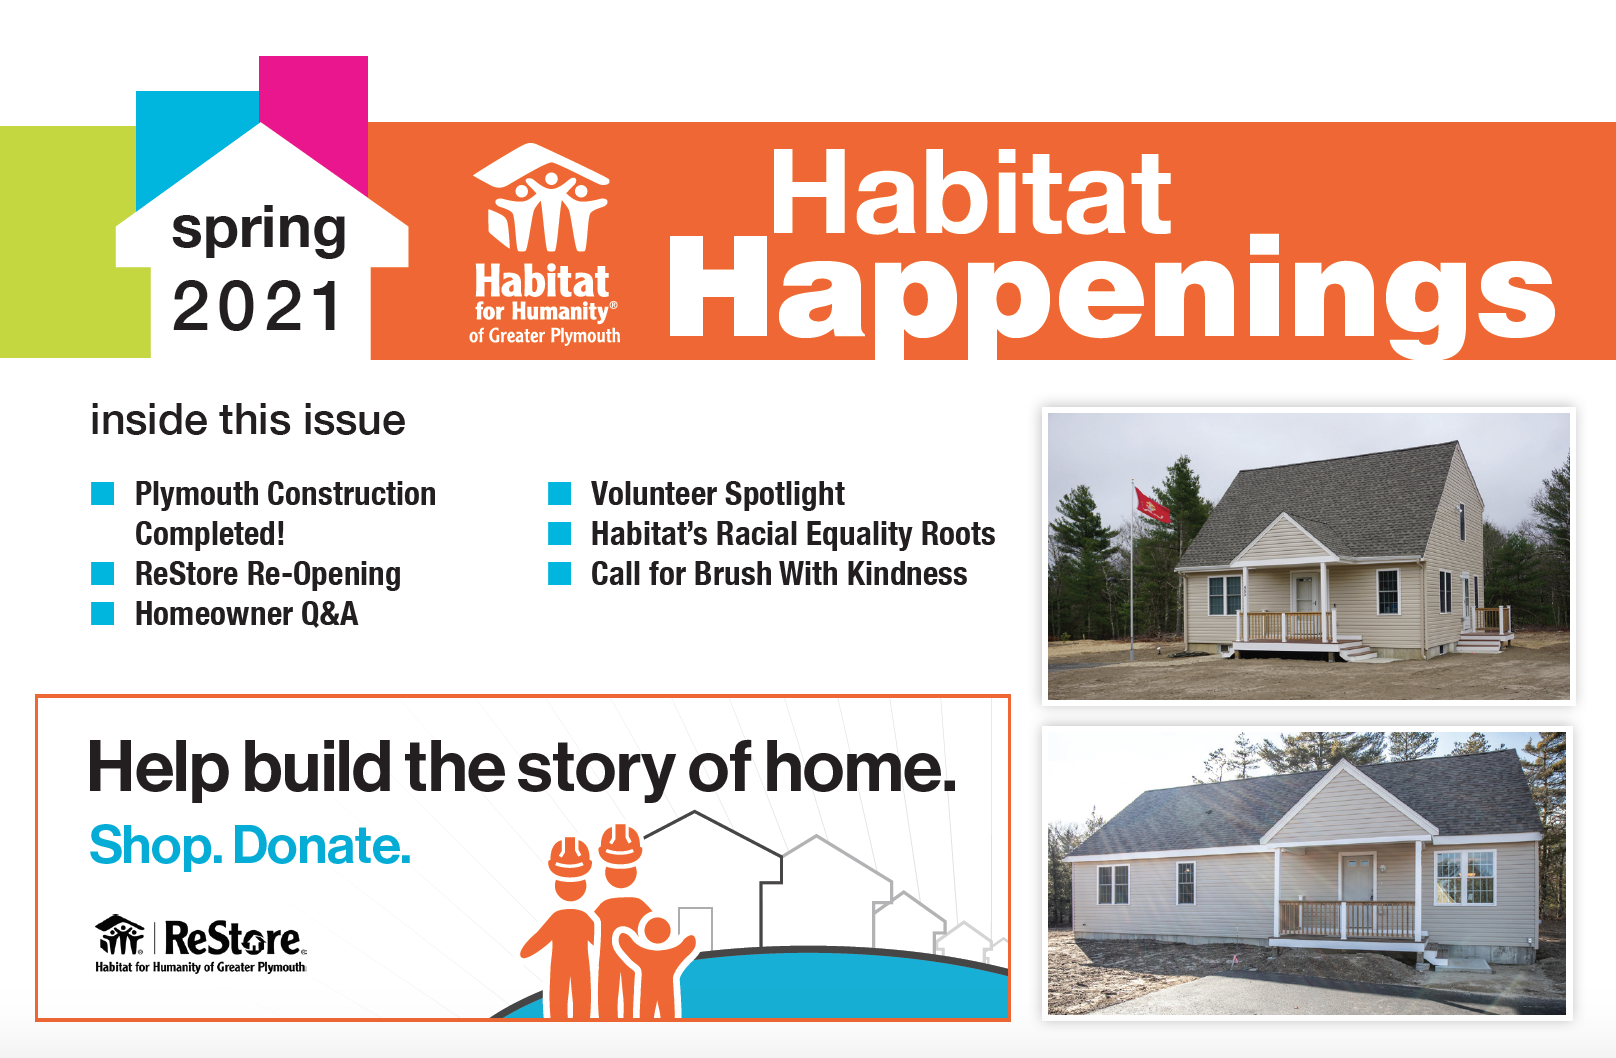 Spring 2021 Habitat Happenings is hot off the press!